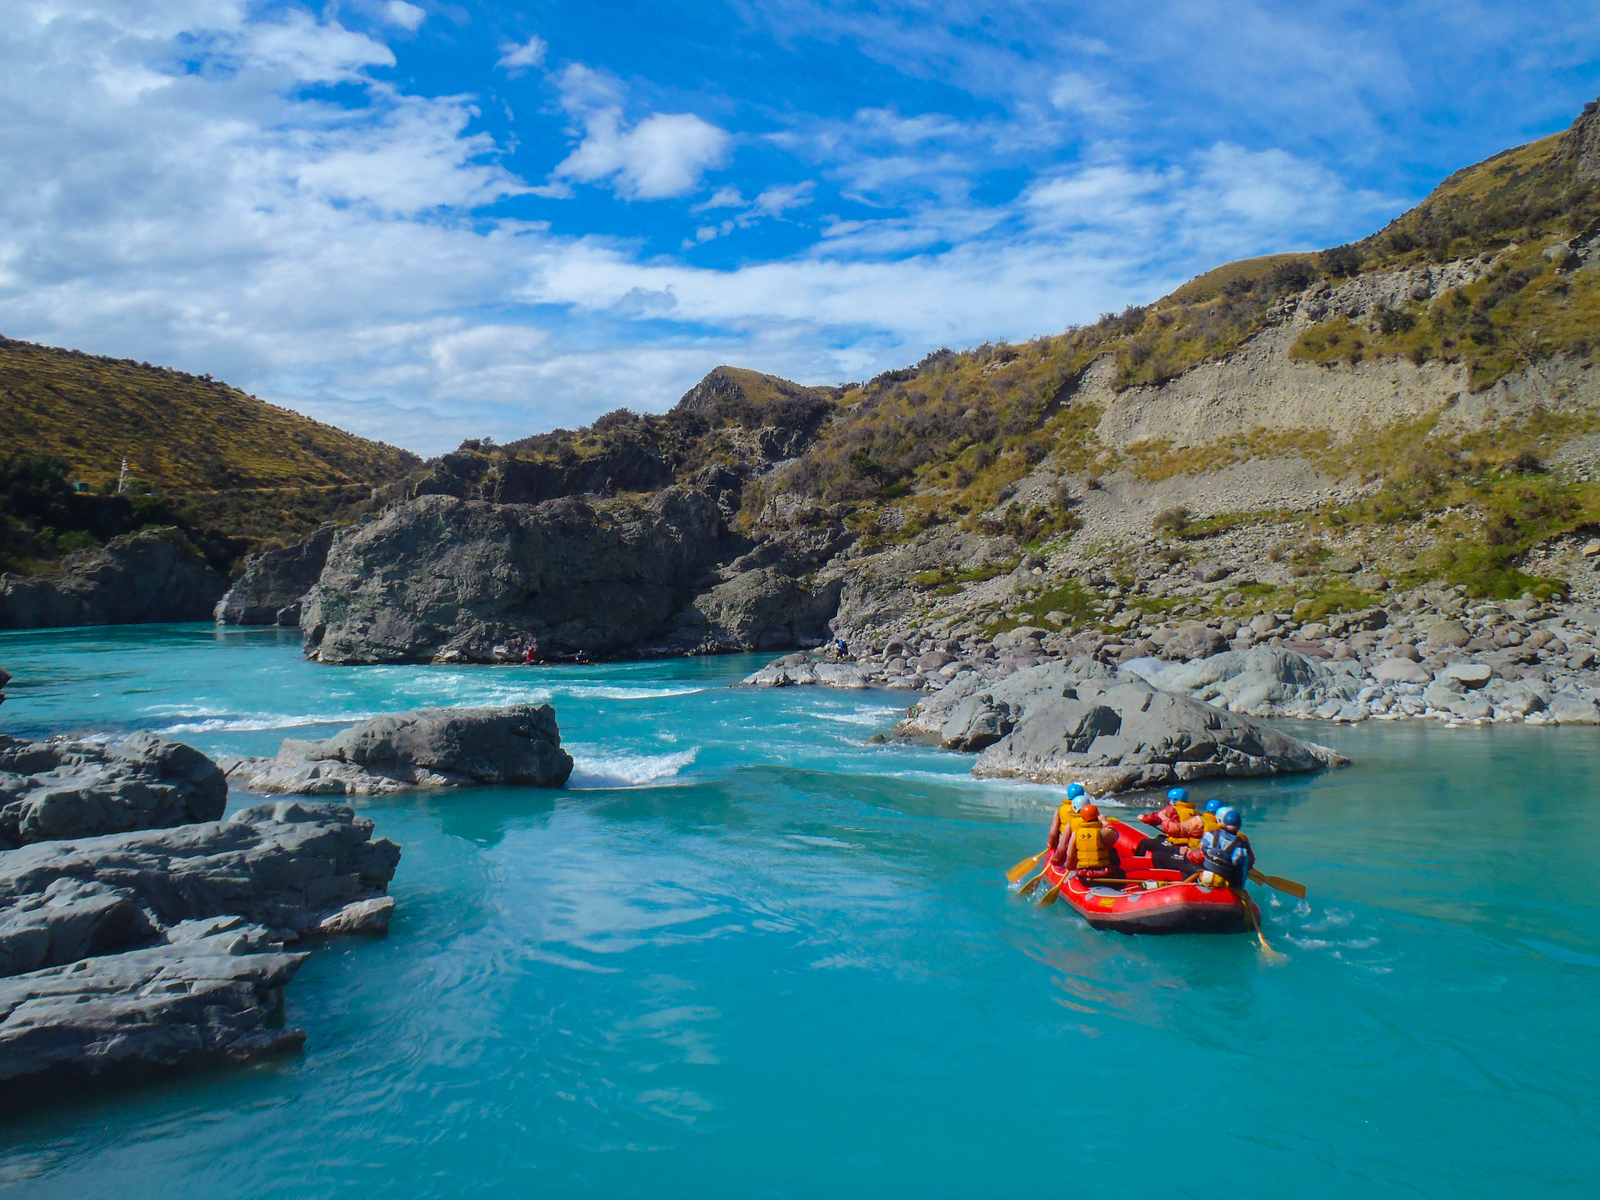 Rafting the Rangitata River in New Zealand.